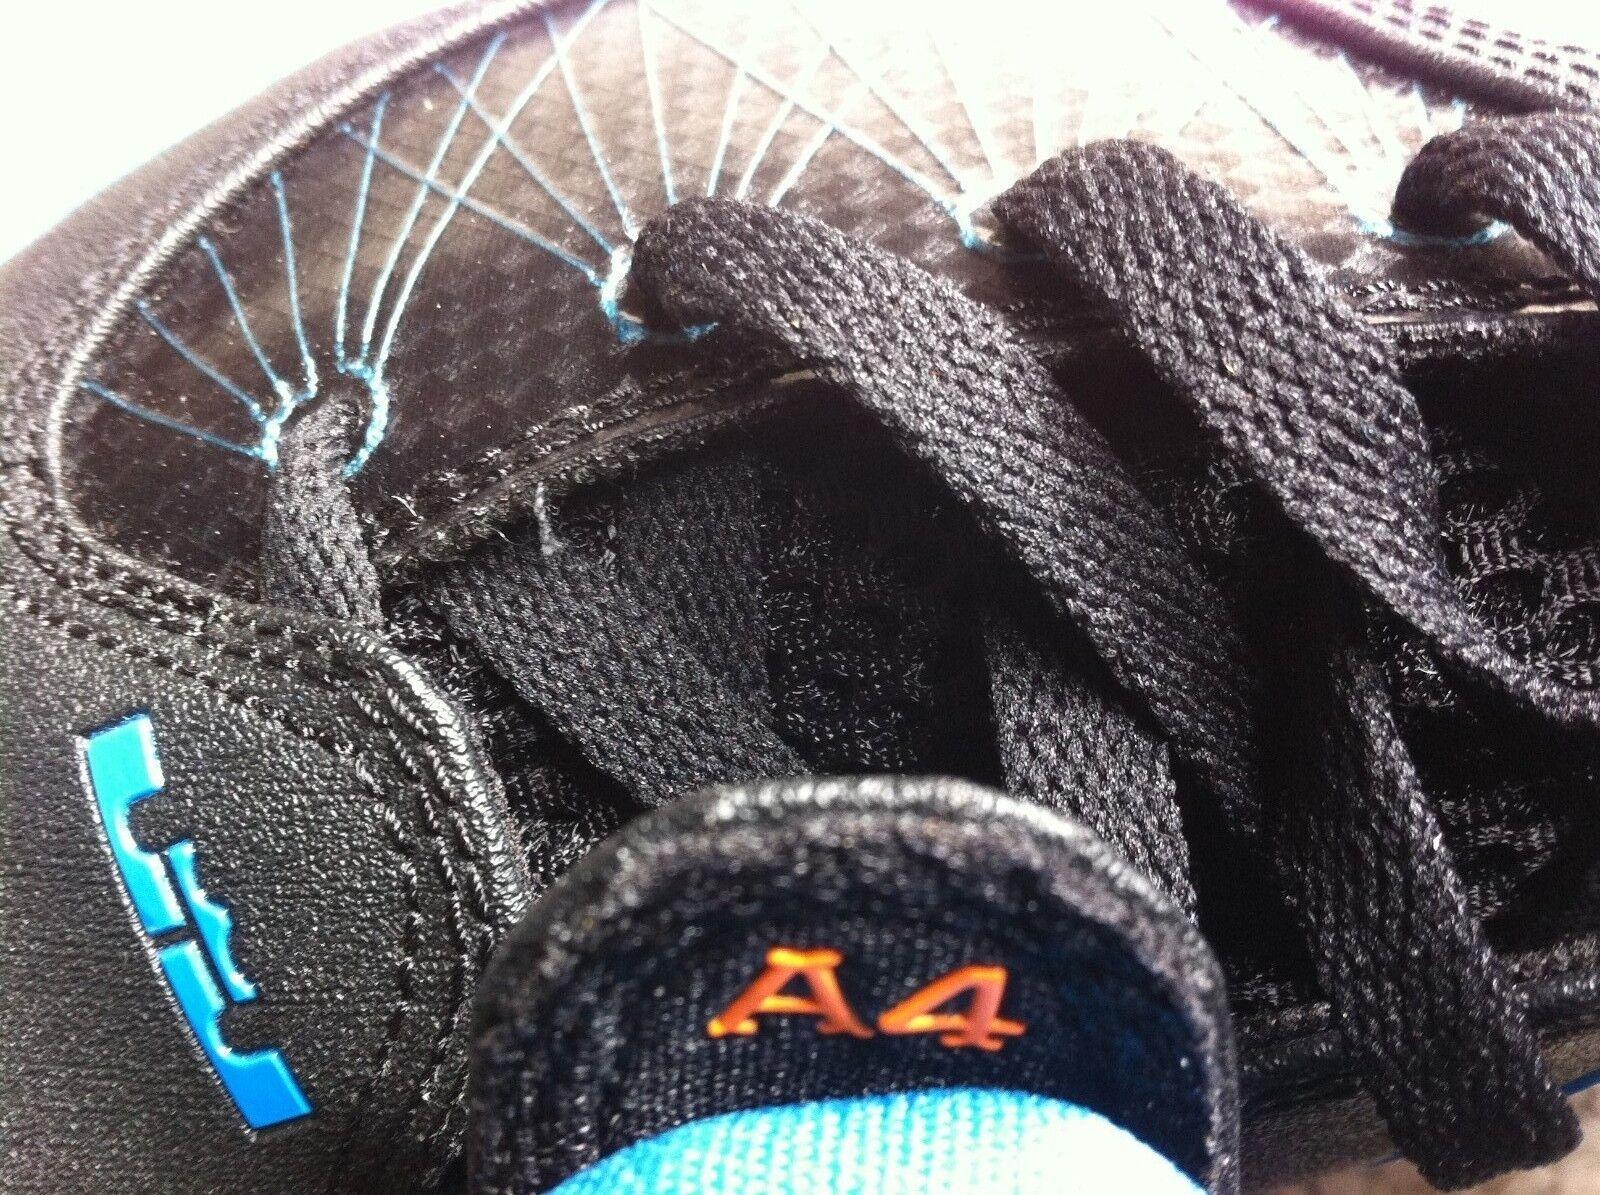 Nike Air Max Max Air Ambassador IV 456815-005 NY Kniks Lebron Black/Neptune Blue USA 12 c7ce62